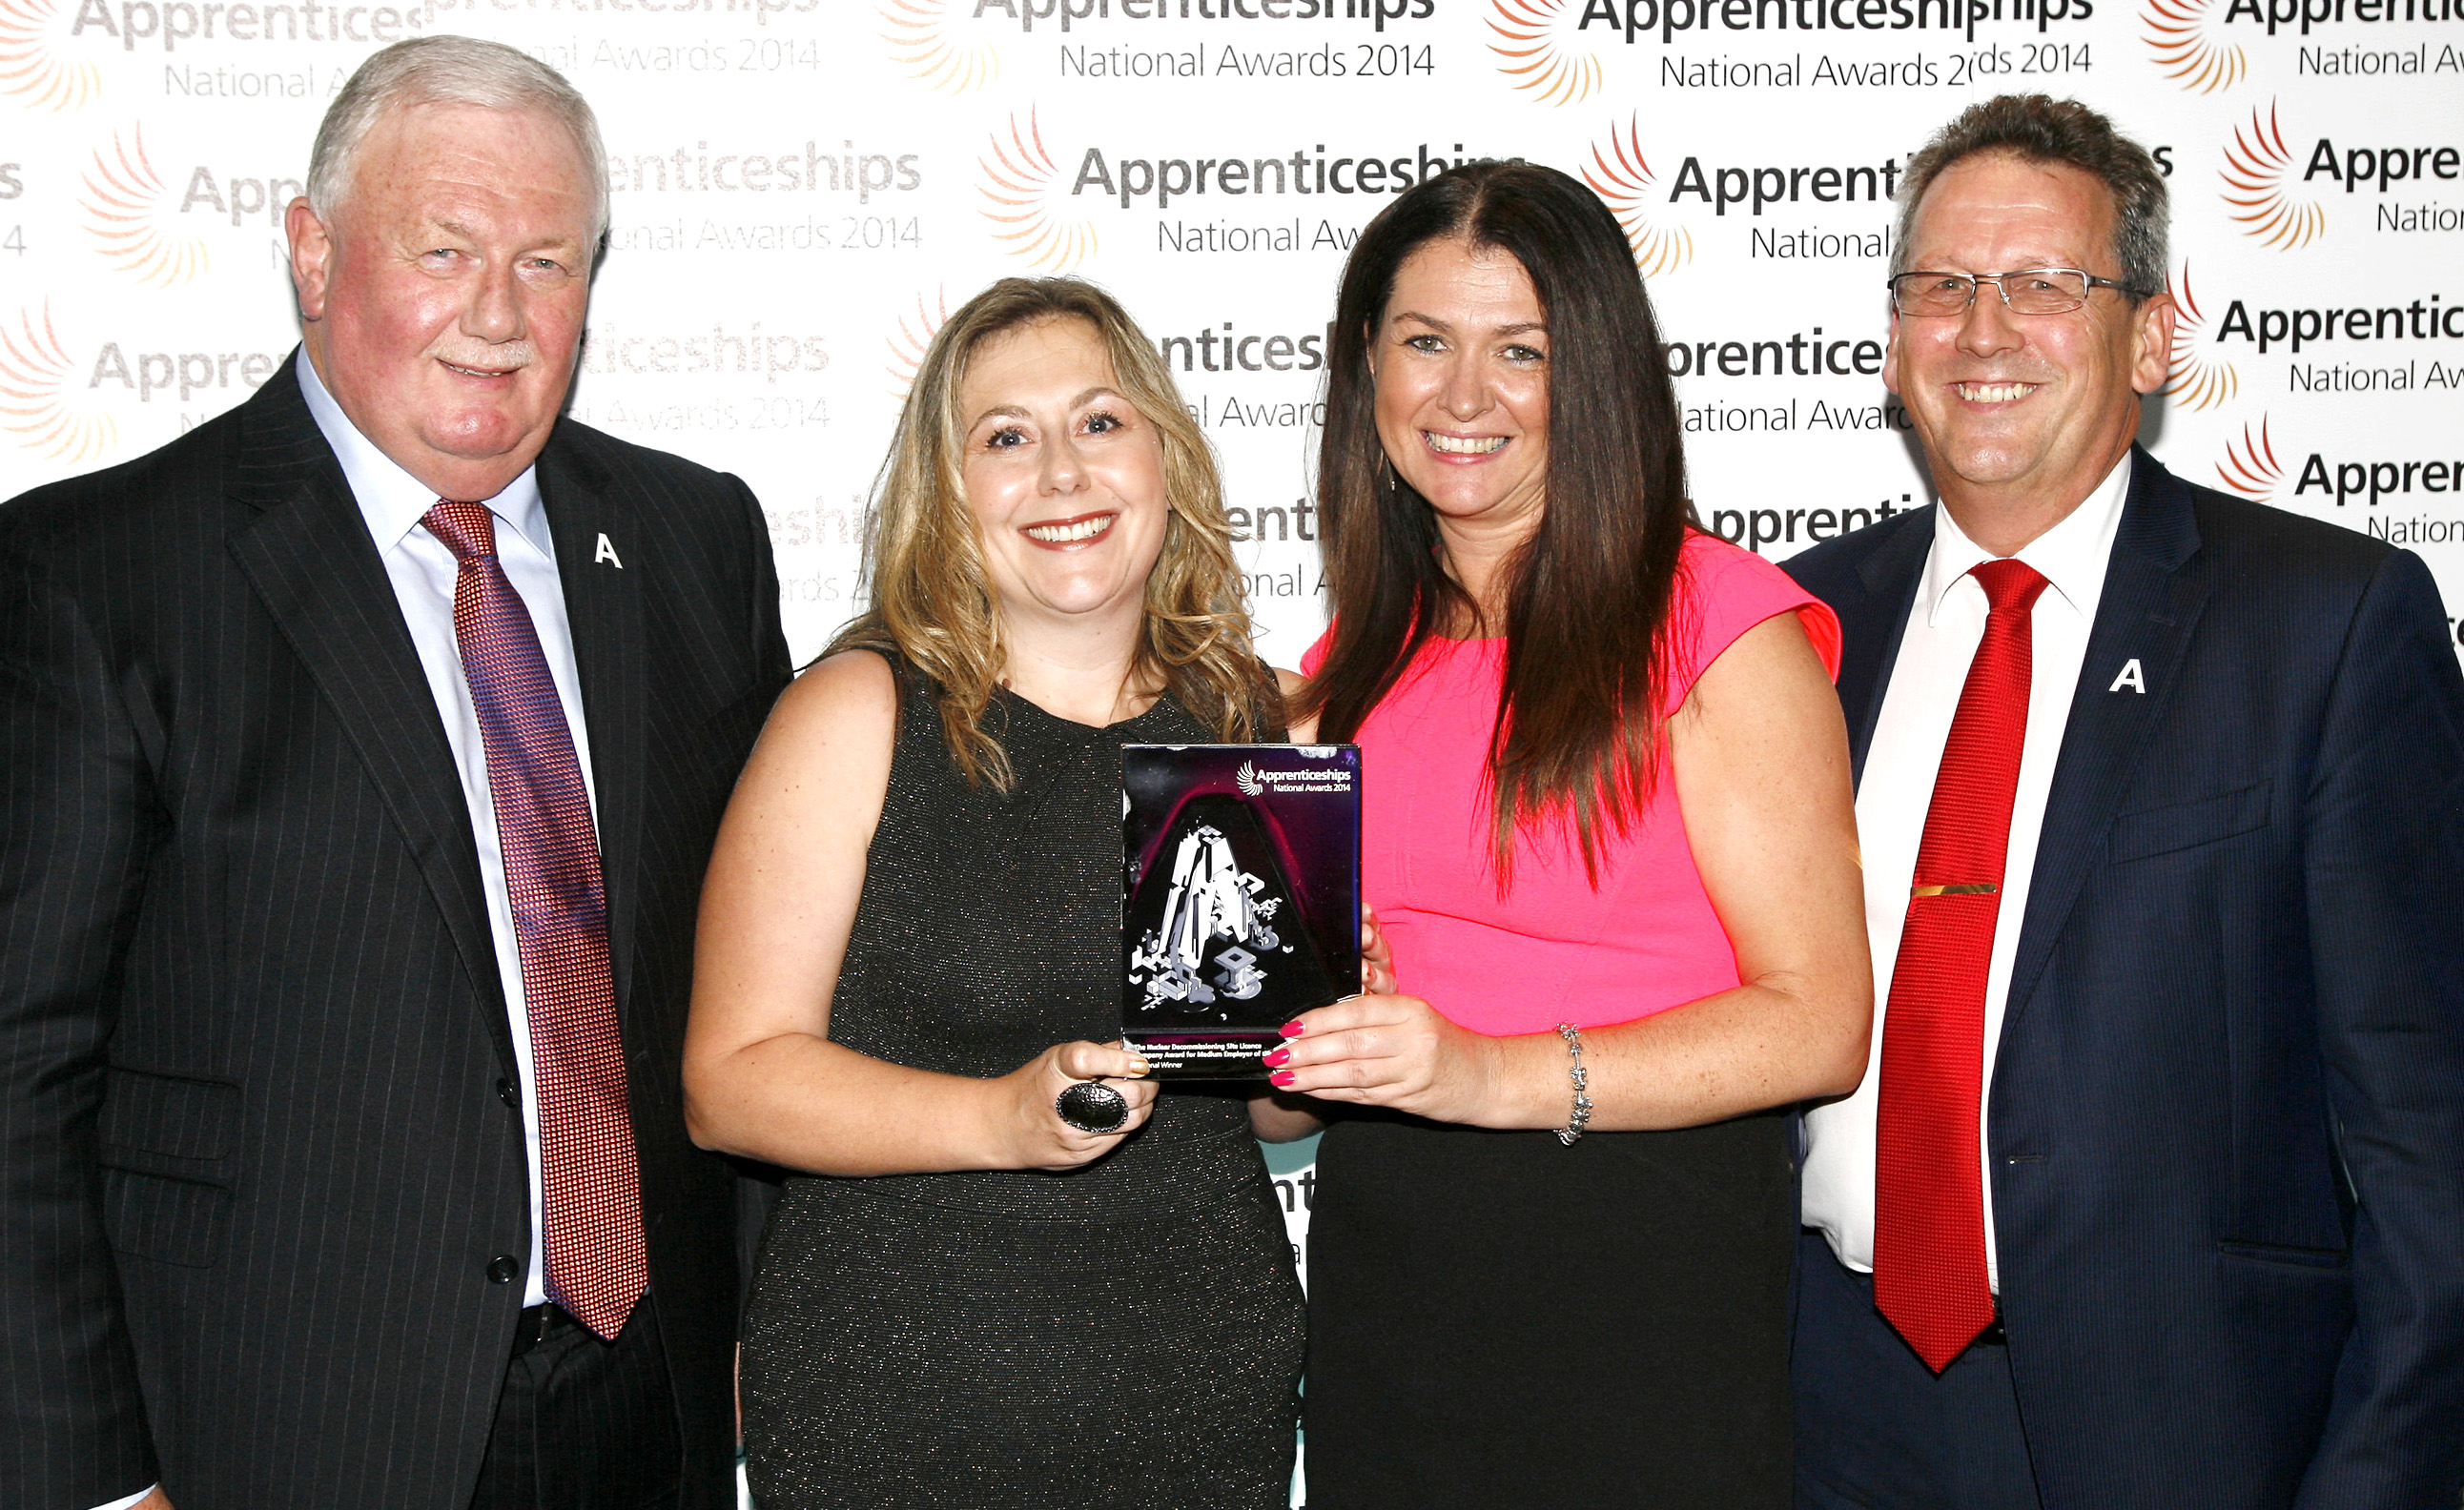 Award for Livin at National Apprenticeship Event